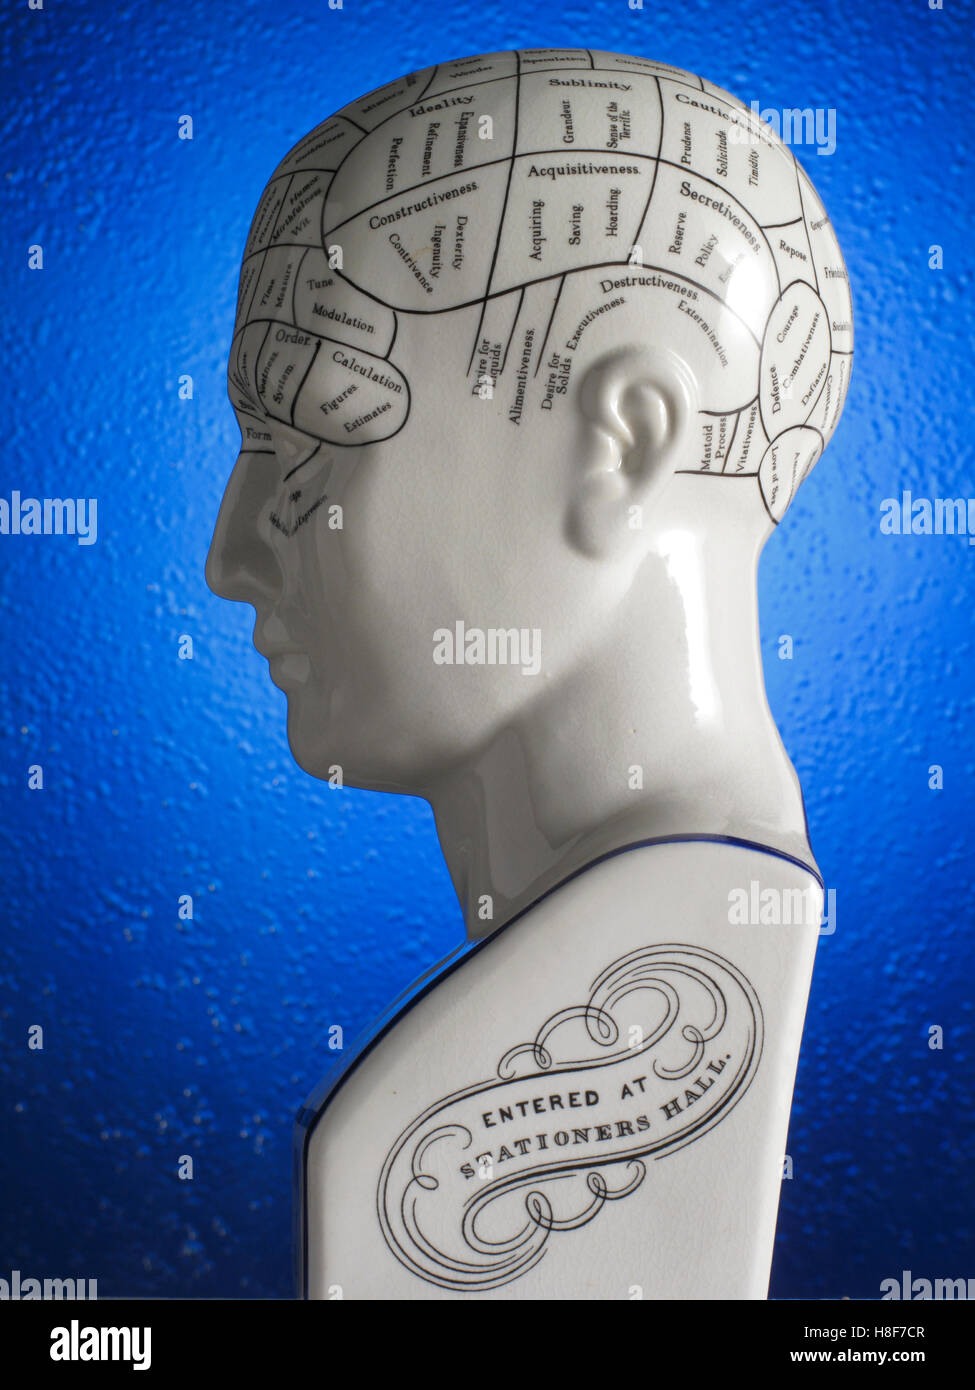 Human Brains Imágenes De Stock & Human Brains Fotos De Stock ...